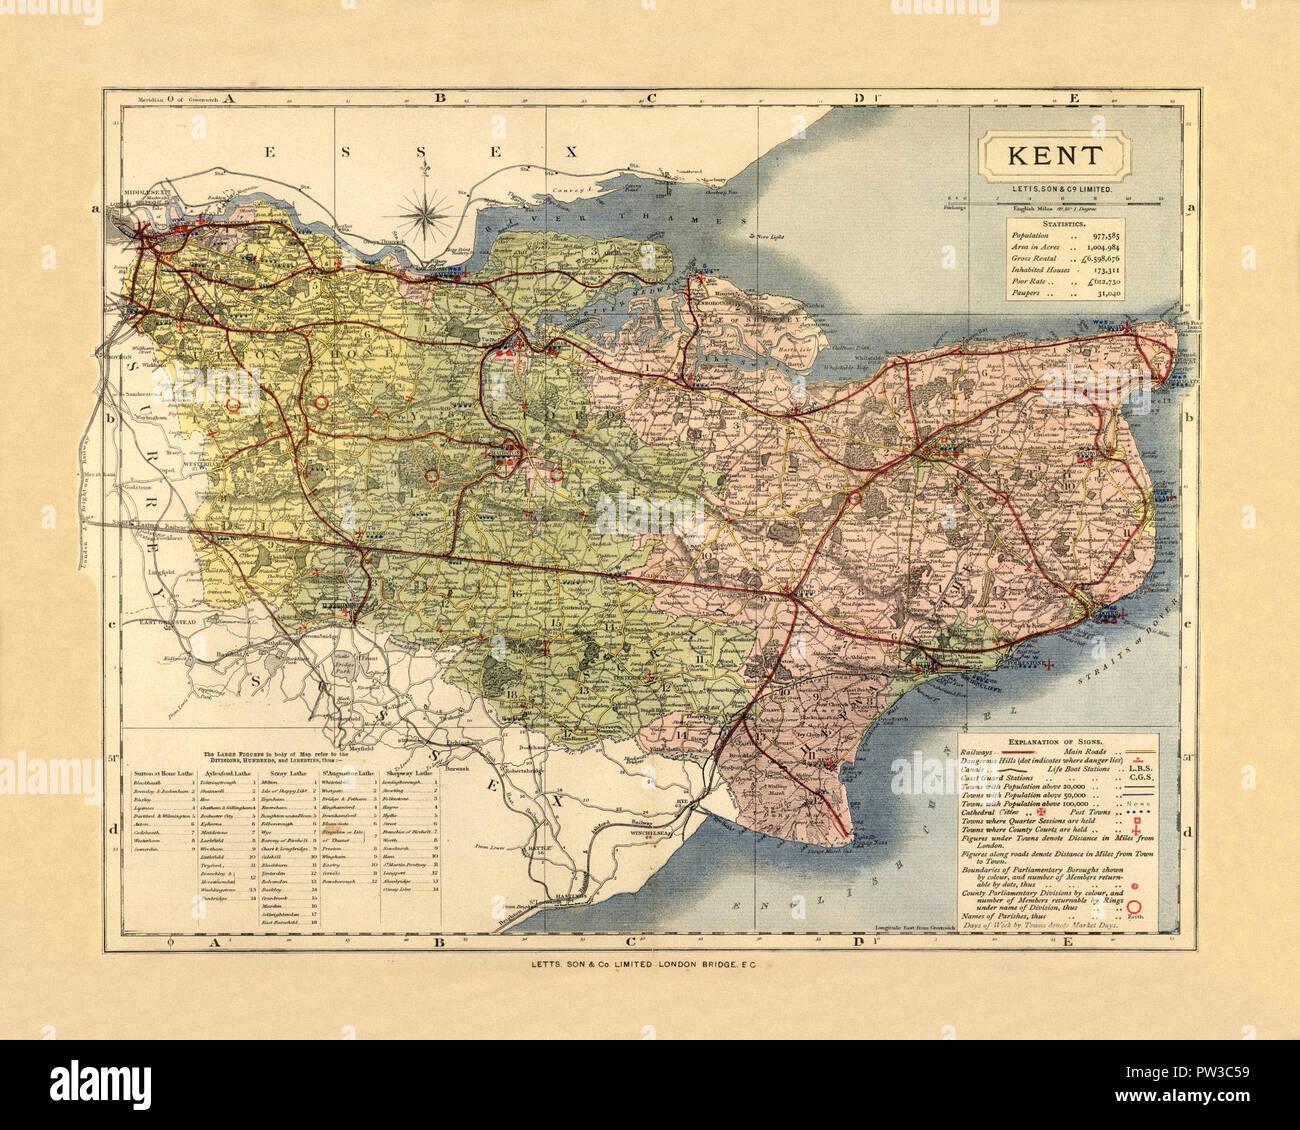 Map Of England Kent.Antique Map Of Kent England Stock Photos Antique Map Of Kent